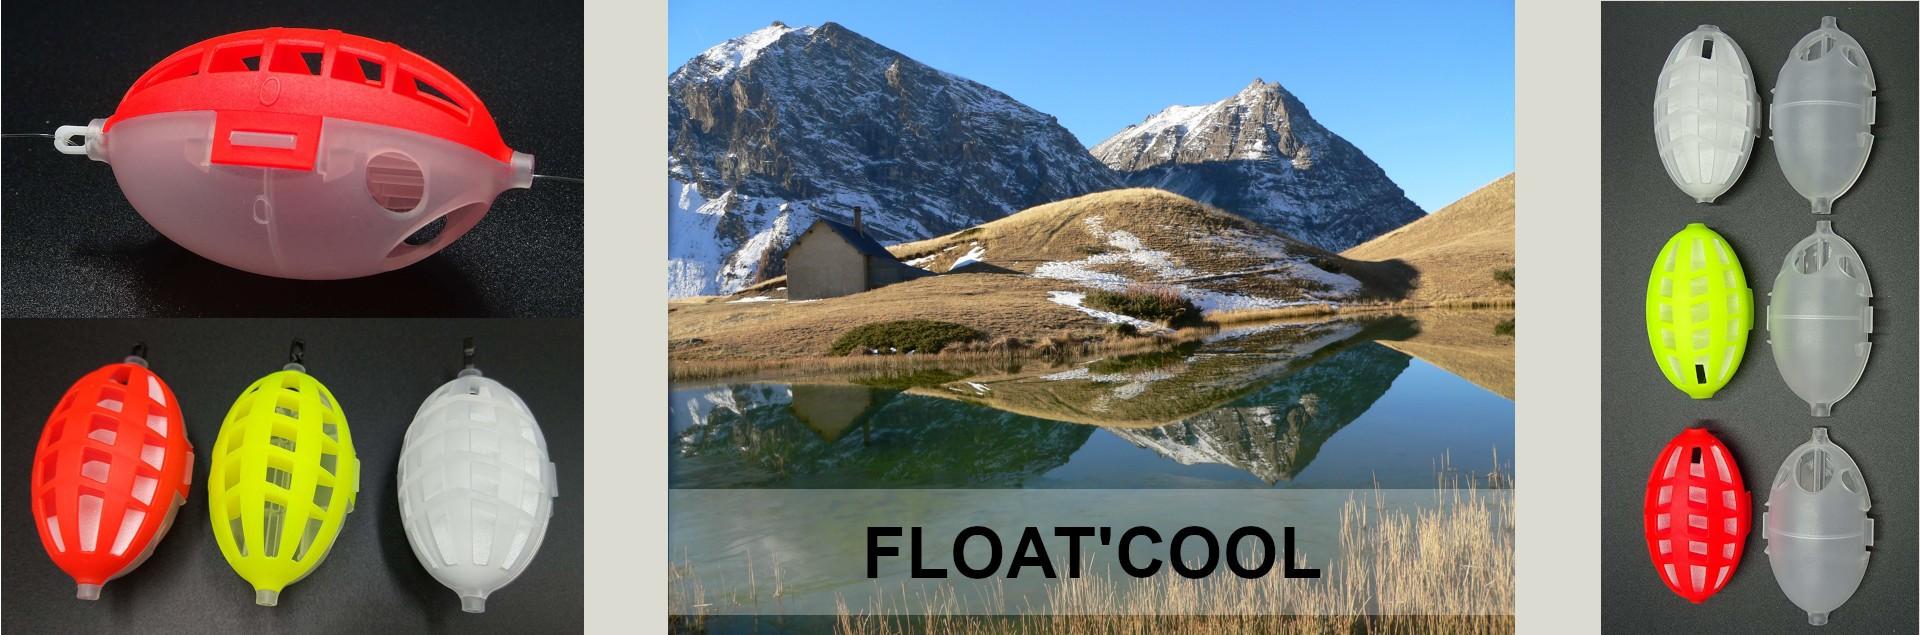 http://www.babazinov.fr/en/fishing/46-flotteur-dynamique-float-cool-3415350000162.html